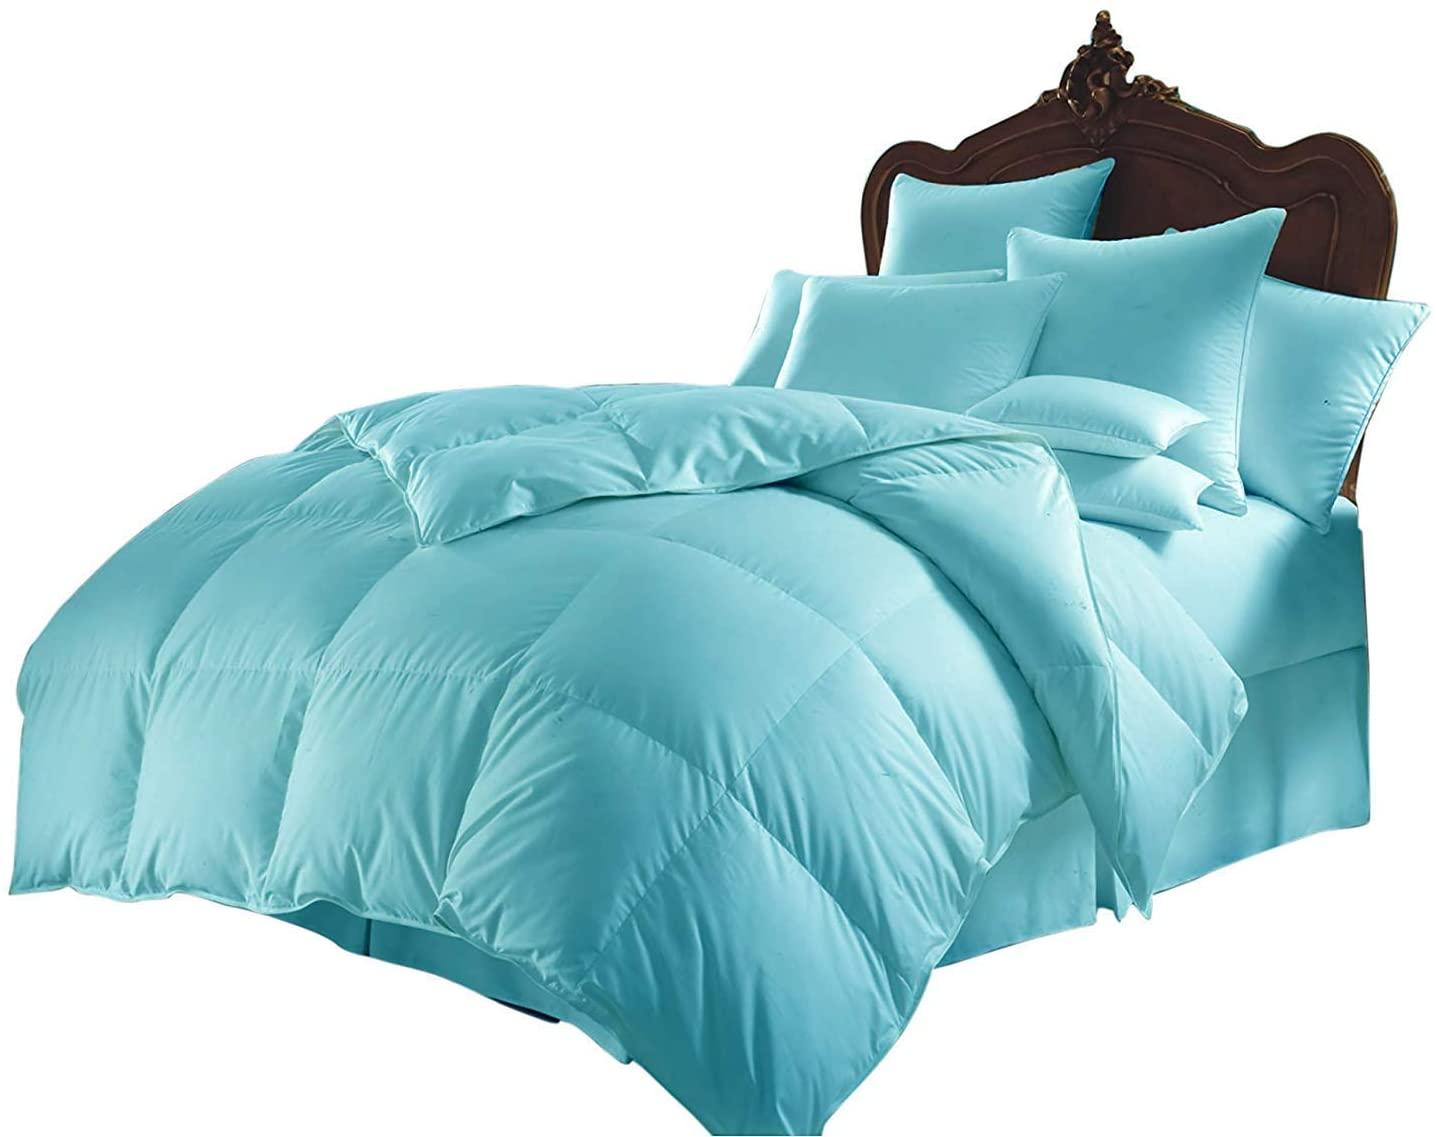 All Season Luxurious 800 Series,Luxury Goose Down Alternative Comforter, Oversized-King Size - Quilt 1 Pc Comforter -100% Egyptian Cotton Comforter Set, Hotel Quality 600 GSM,Aqua Blue,(98